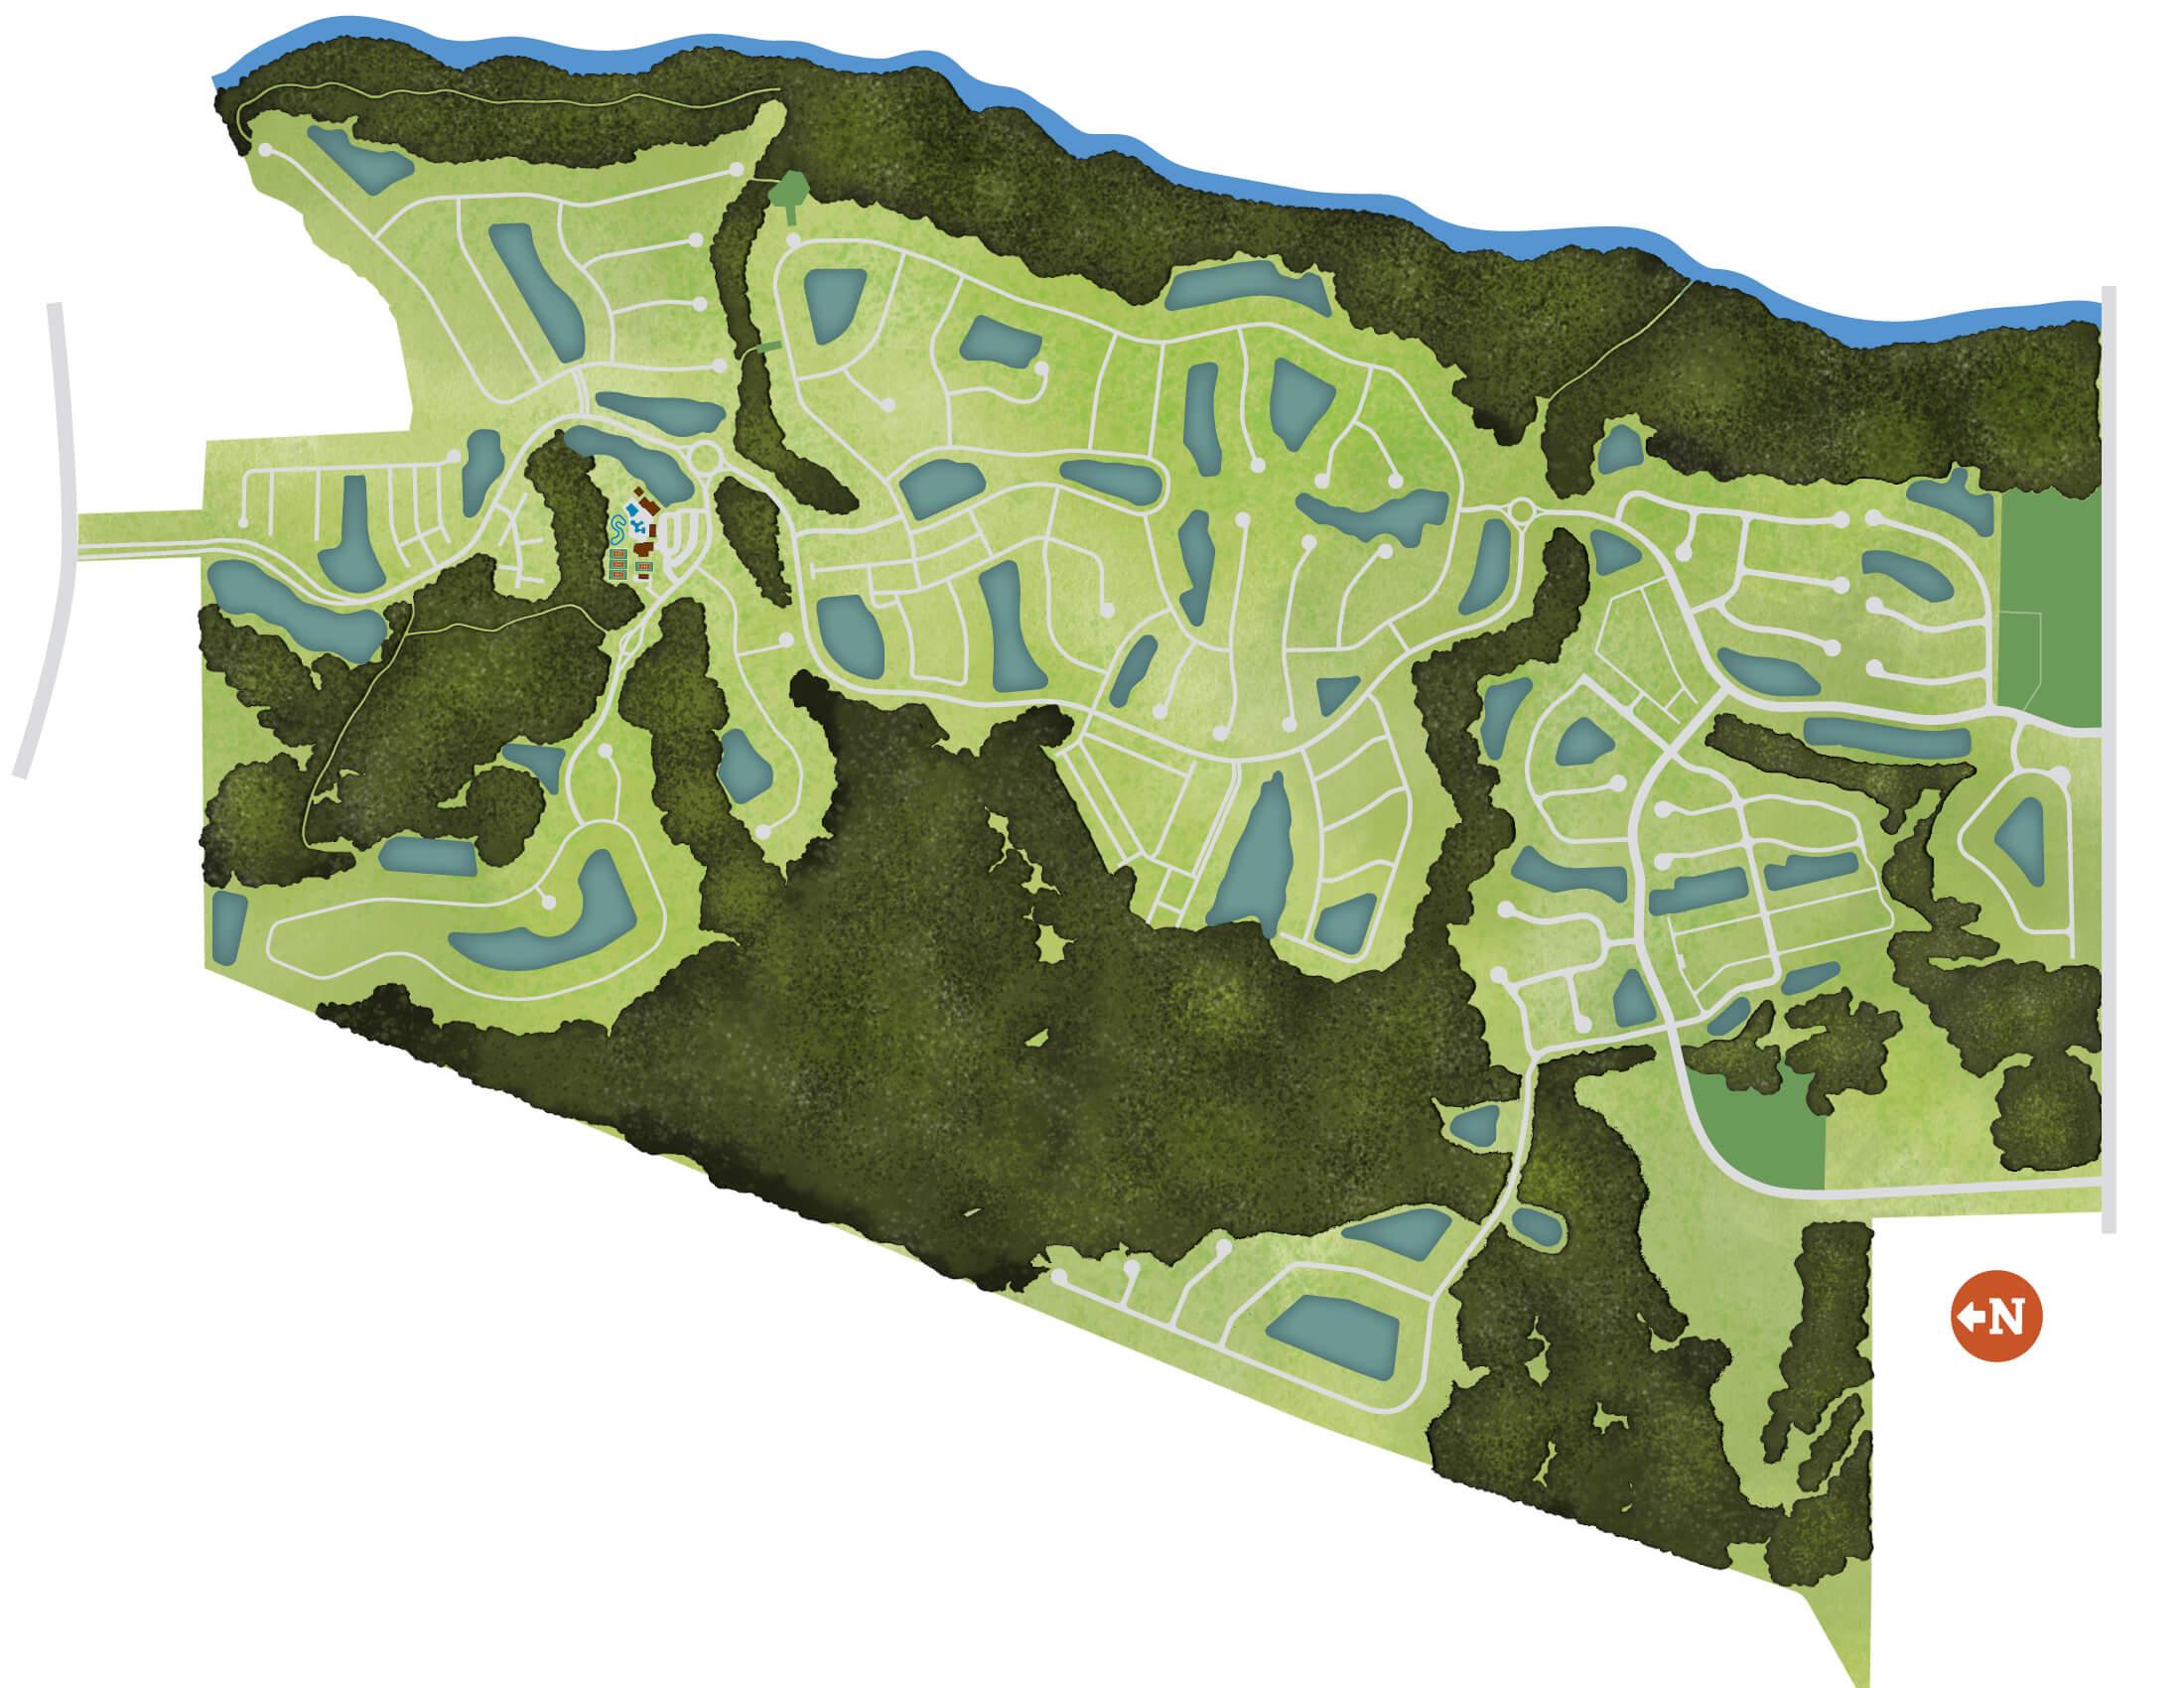 Shearwater site plan illustrative graphic